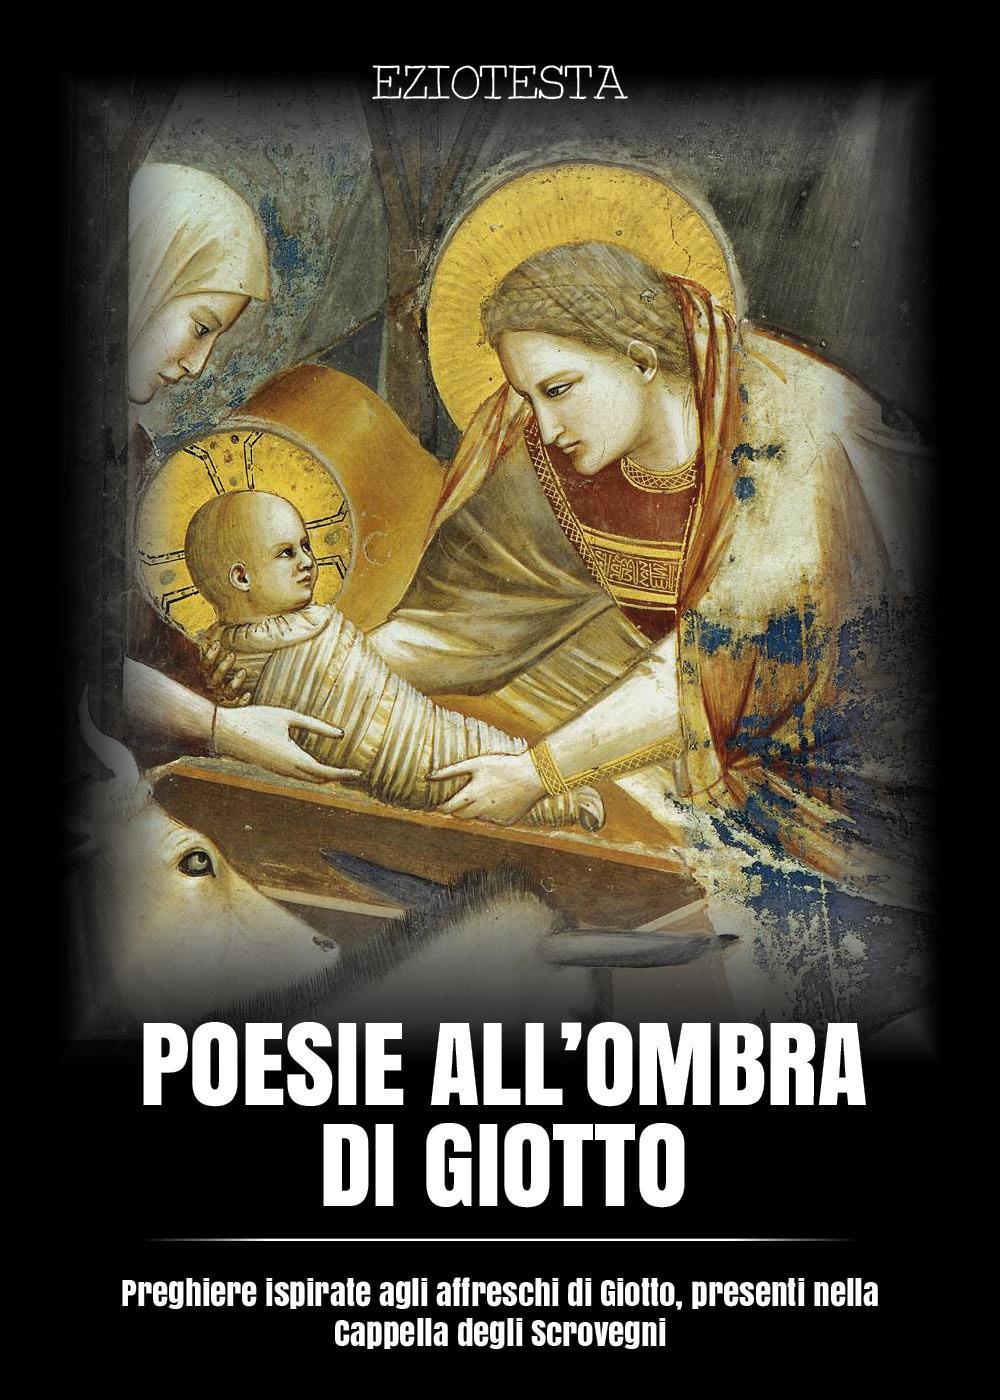 Poesie all'ombra di Giotto